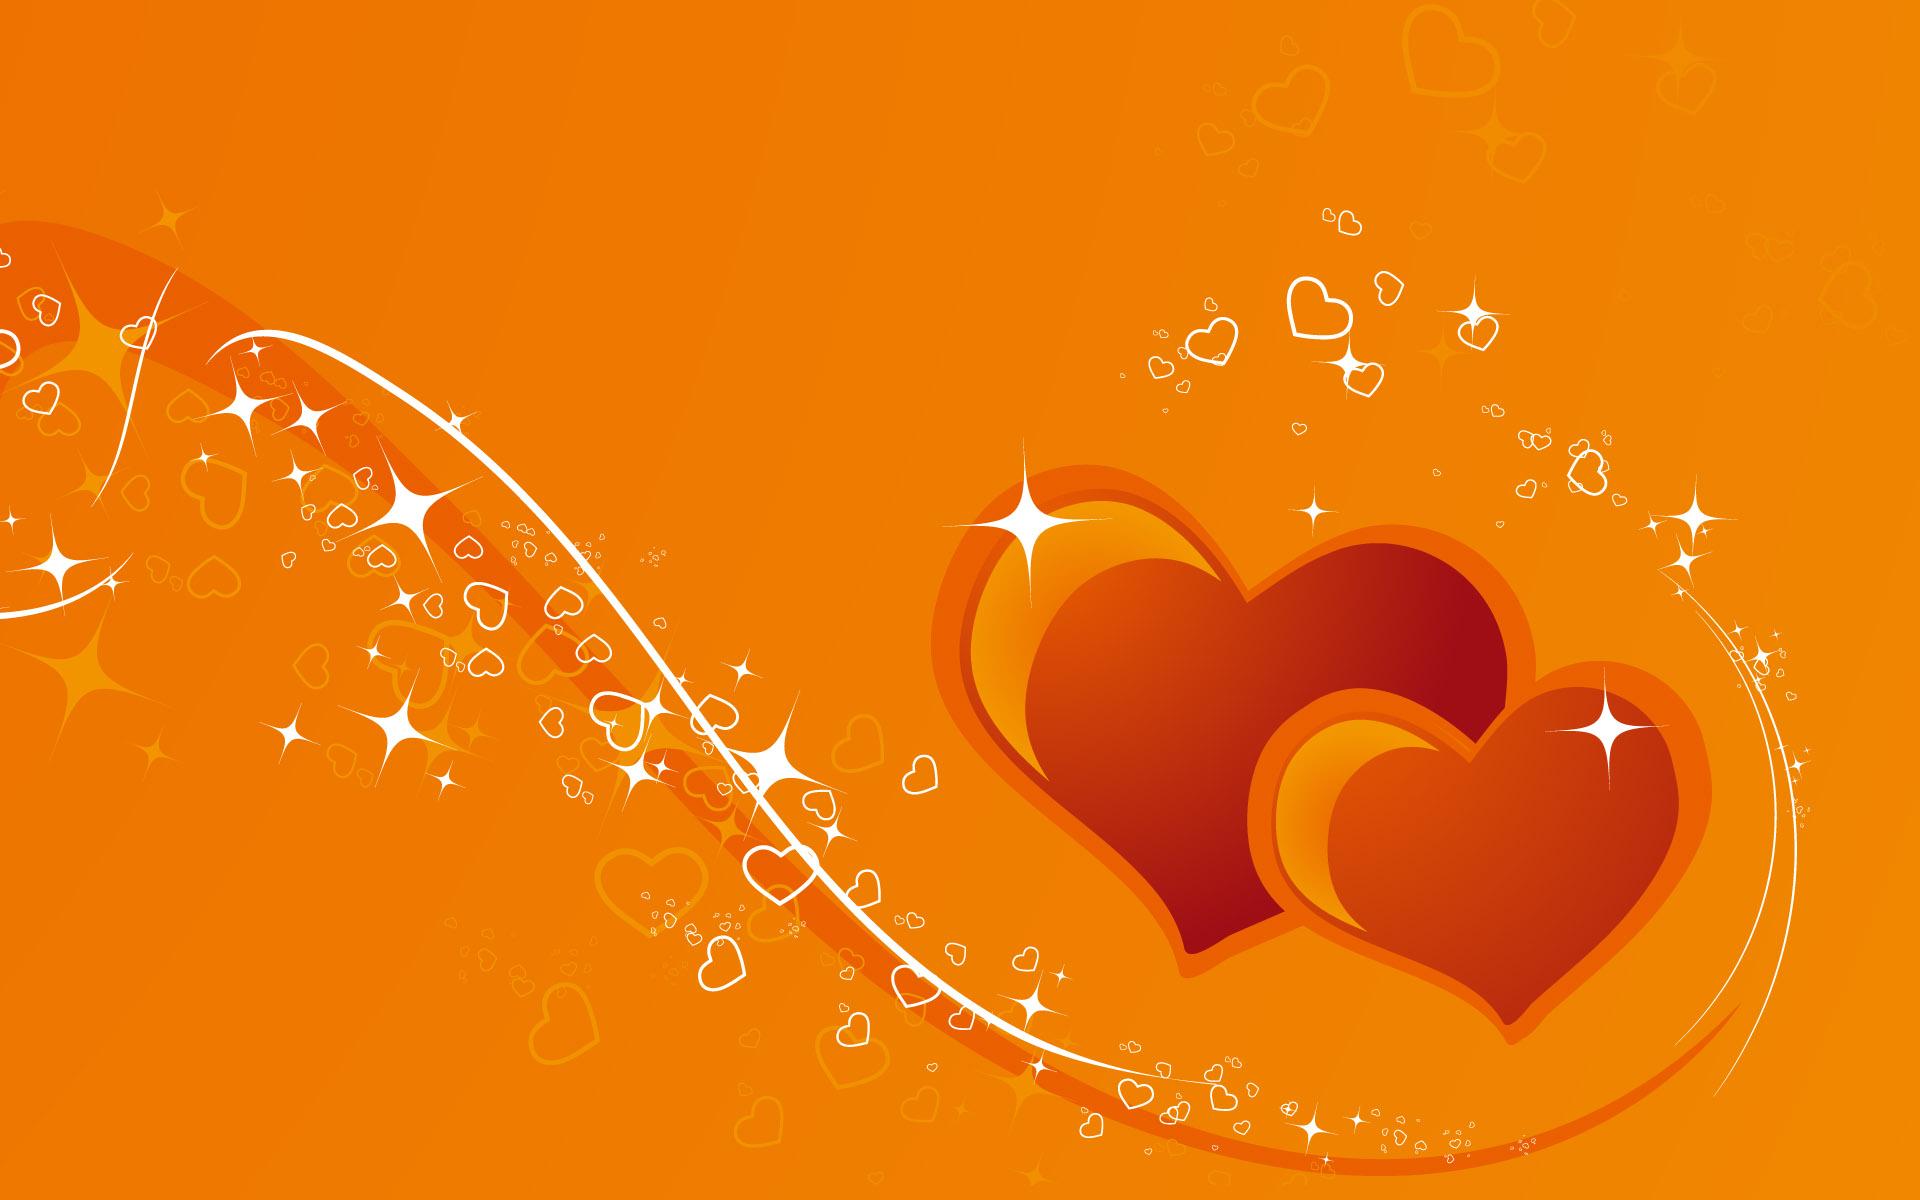 Wallpapers HD Valentine Wallpapers Desktop Backgrounds Valentine 1920x1200